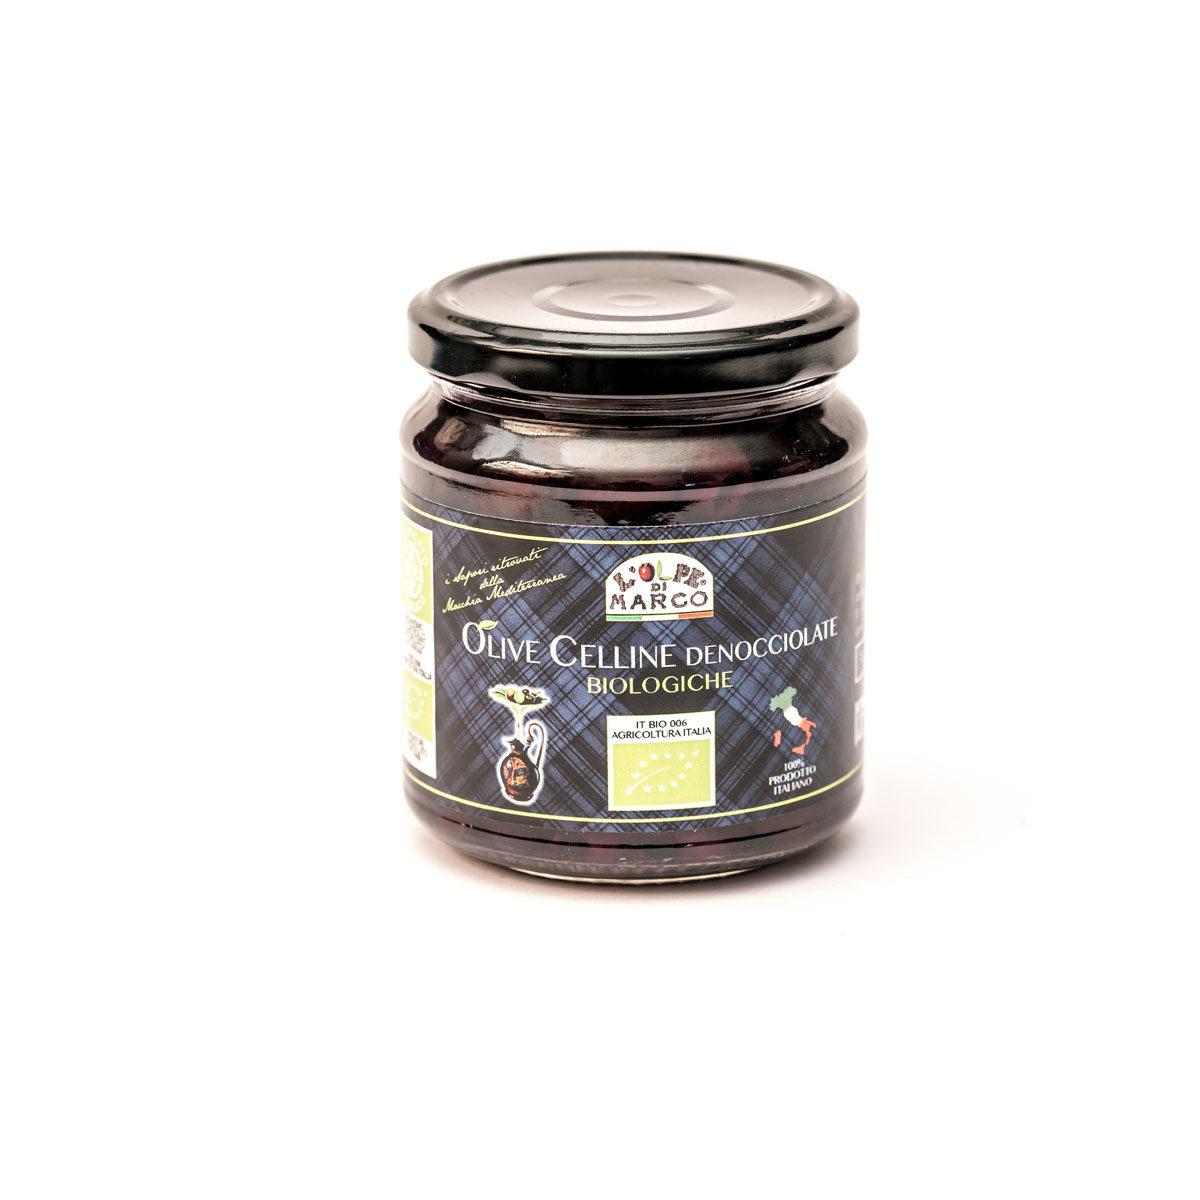 Olive-celline